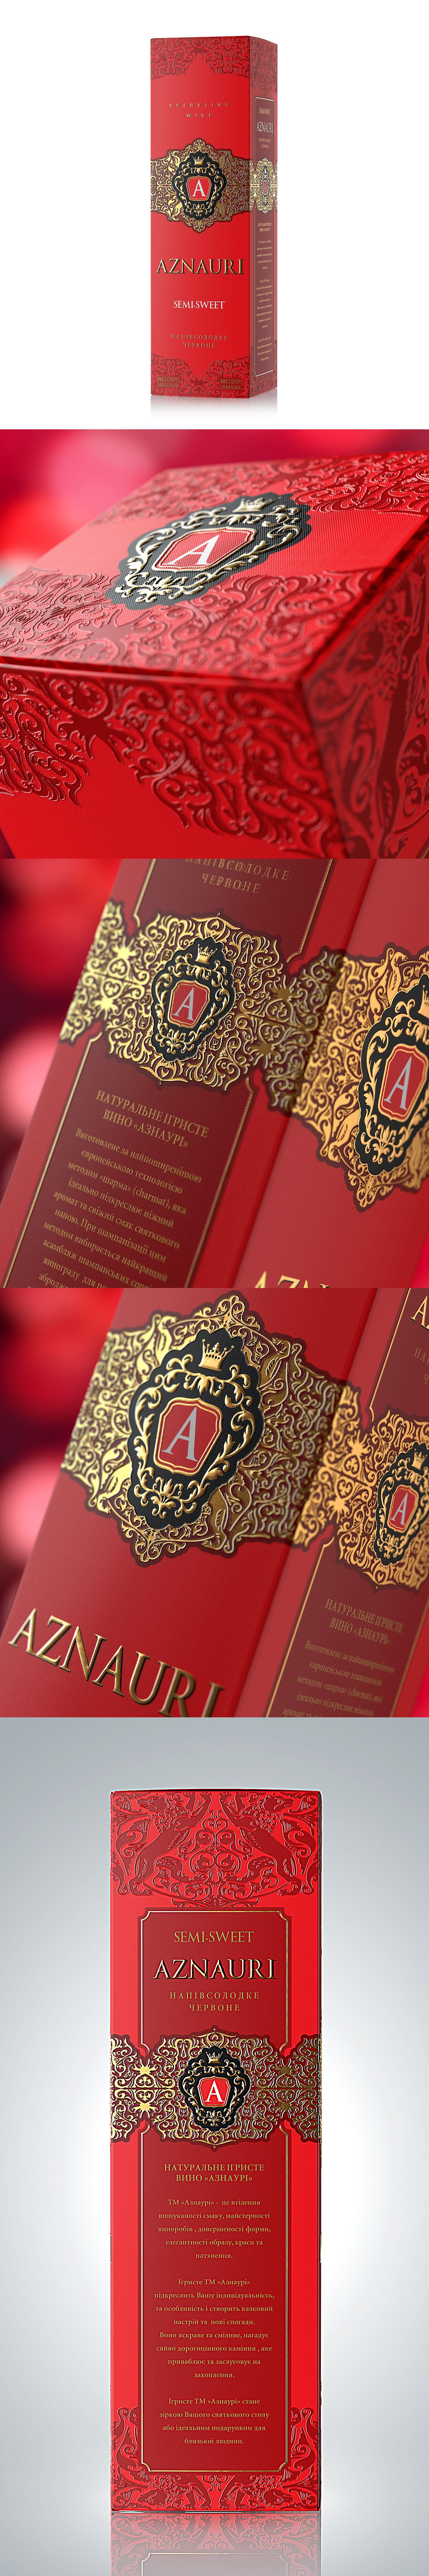 Aznauri Sparkling Gift Box Sparkle Gift Sparkling Wine Graphic Design Packaging